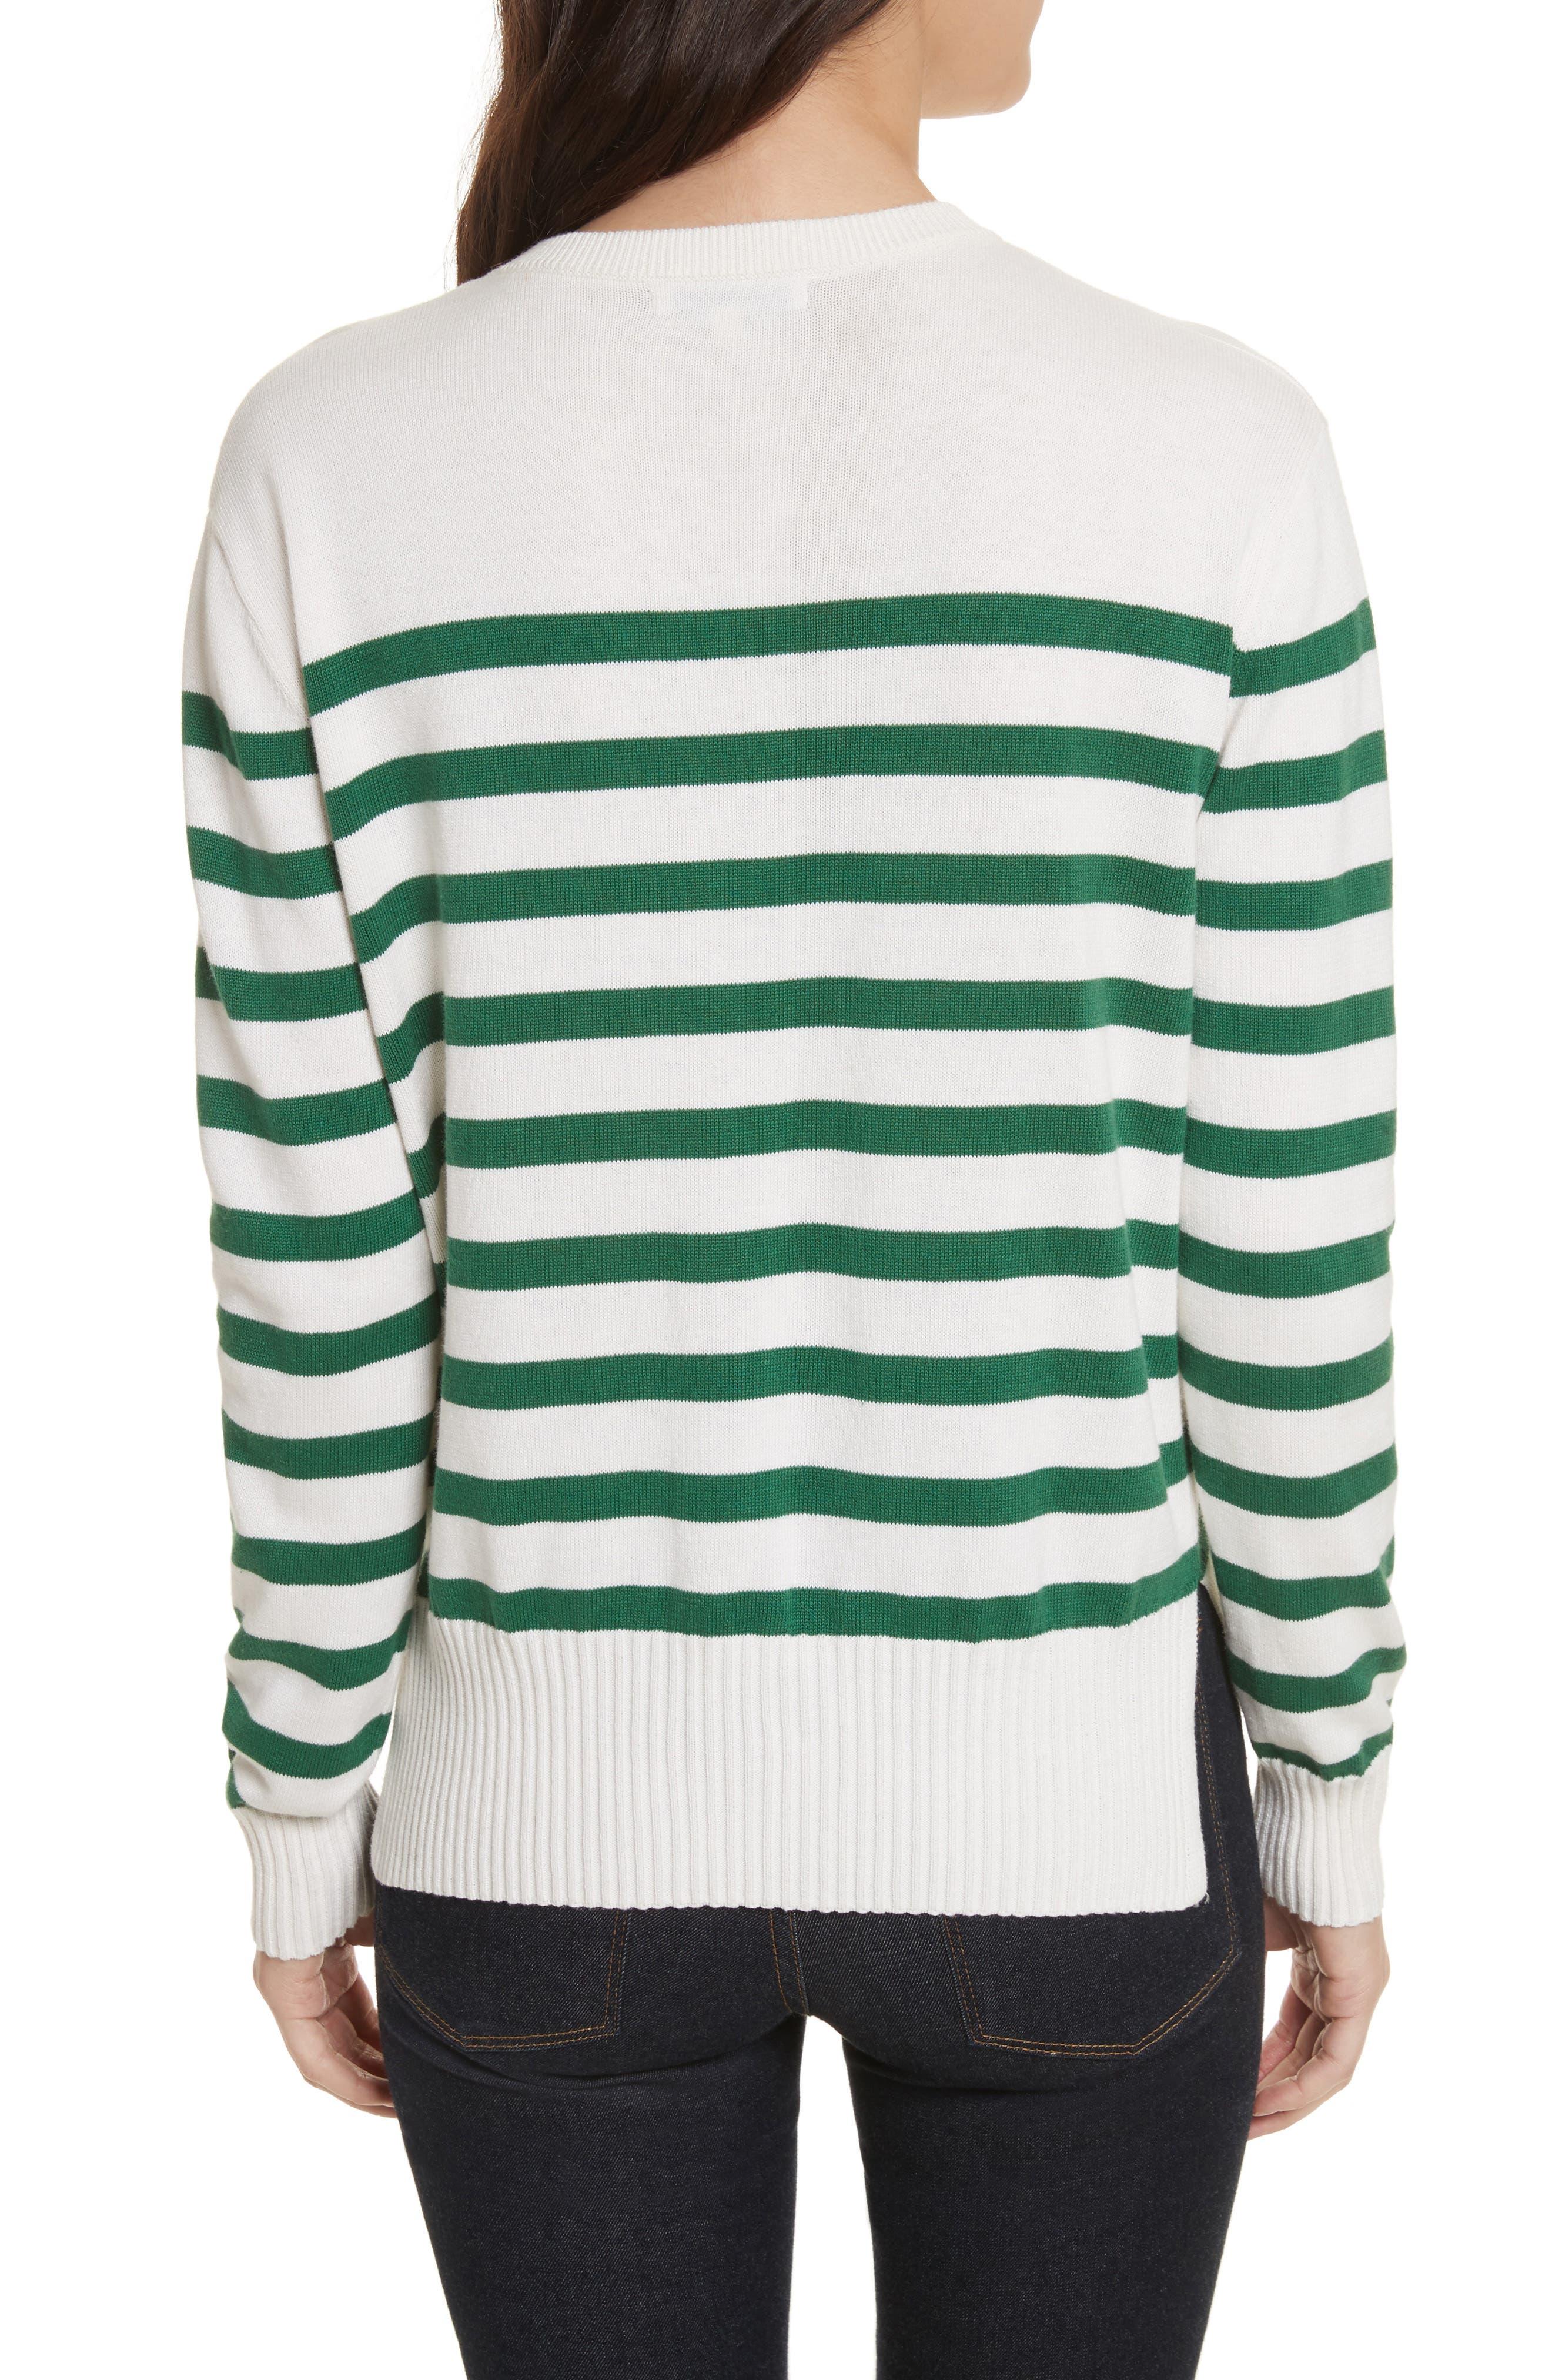 Winston Sweater,                             Alternate thumbnail 2, color,                             134